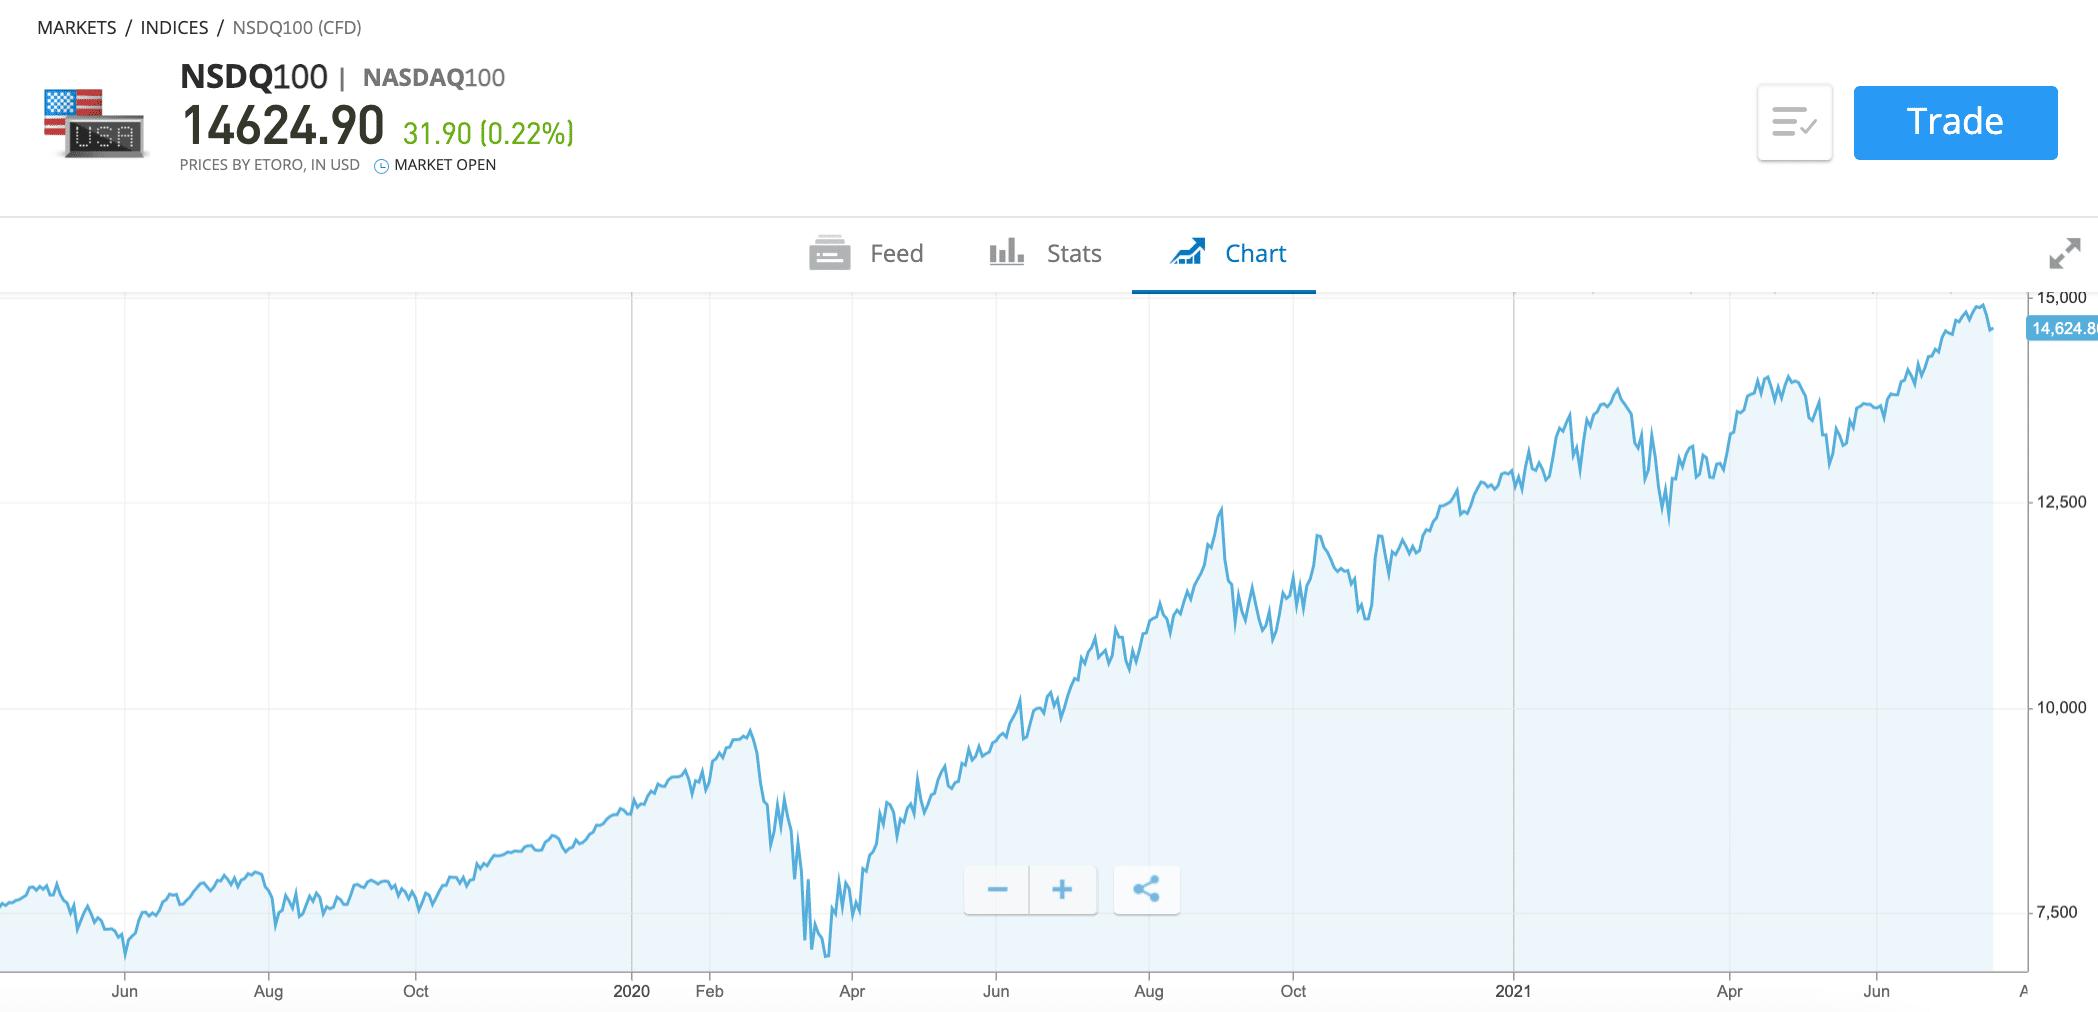 nasdaq price movements